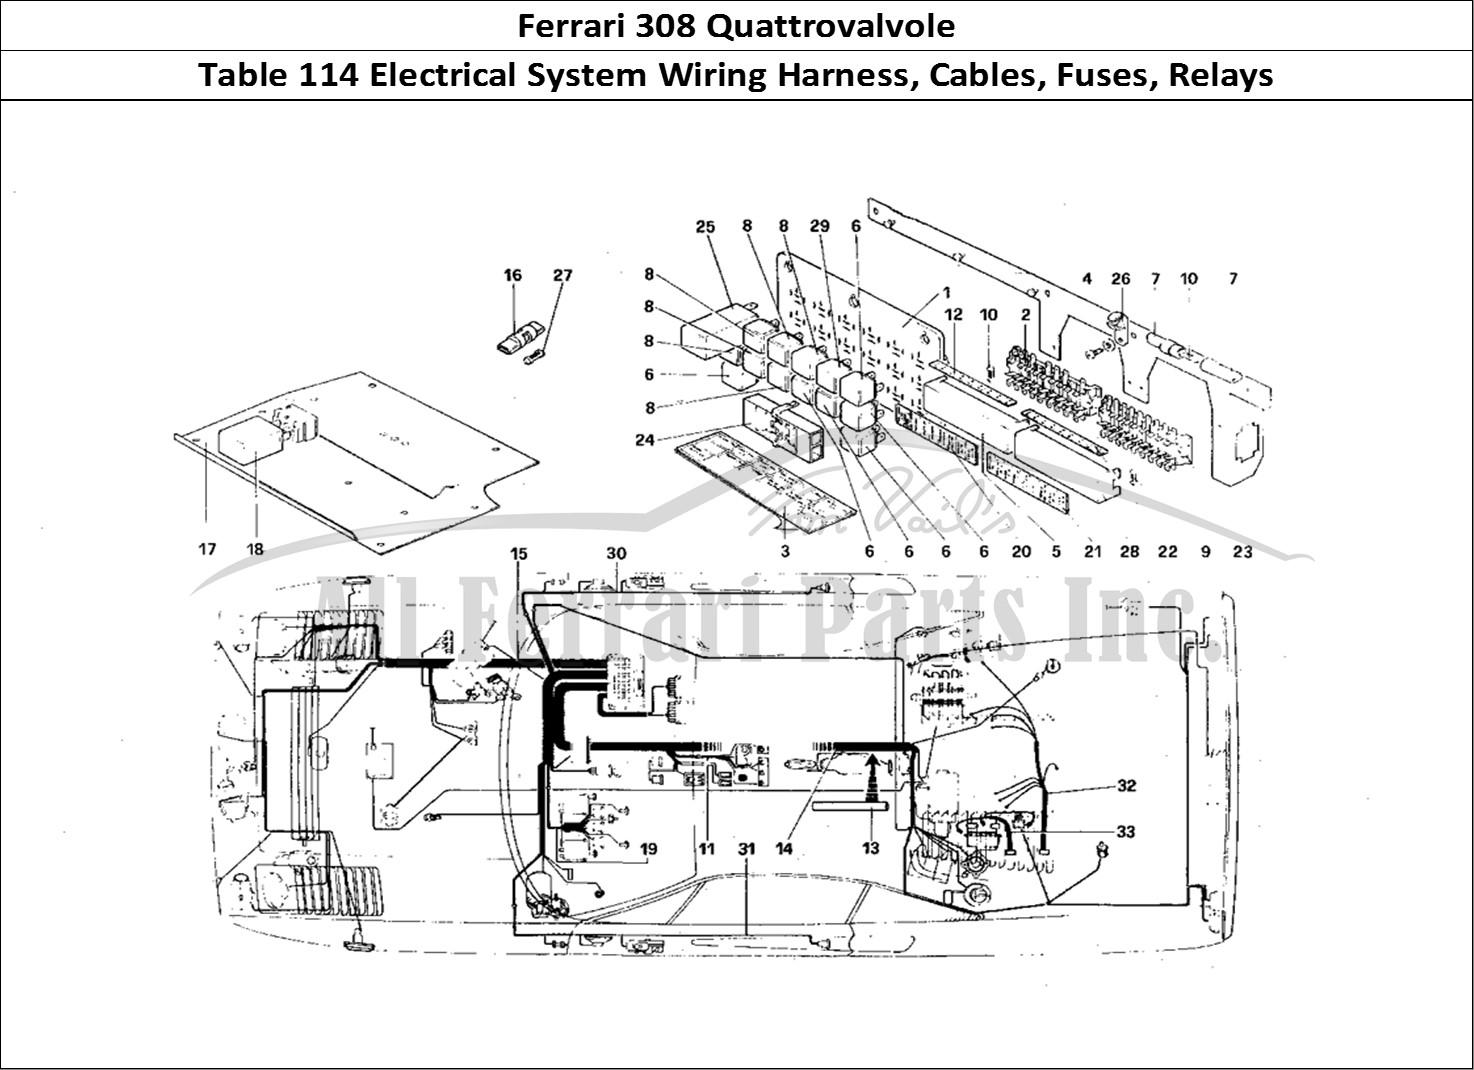 Buy Original Ferrari 308 Quattrovalvole 114 Electrical